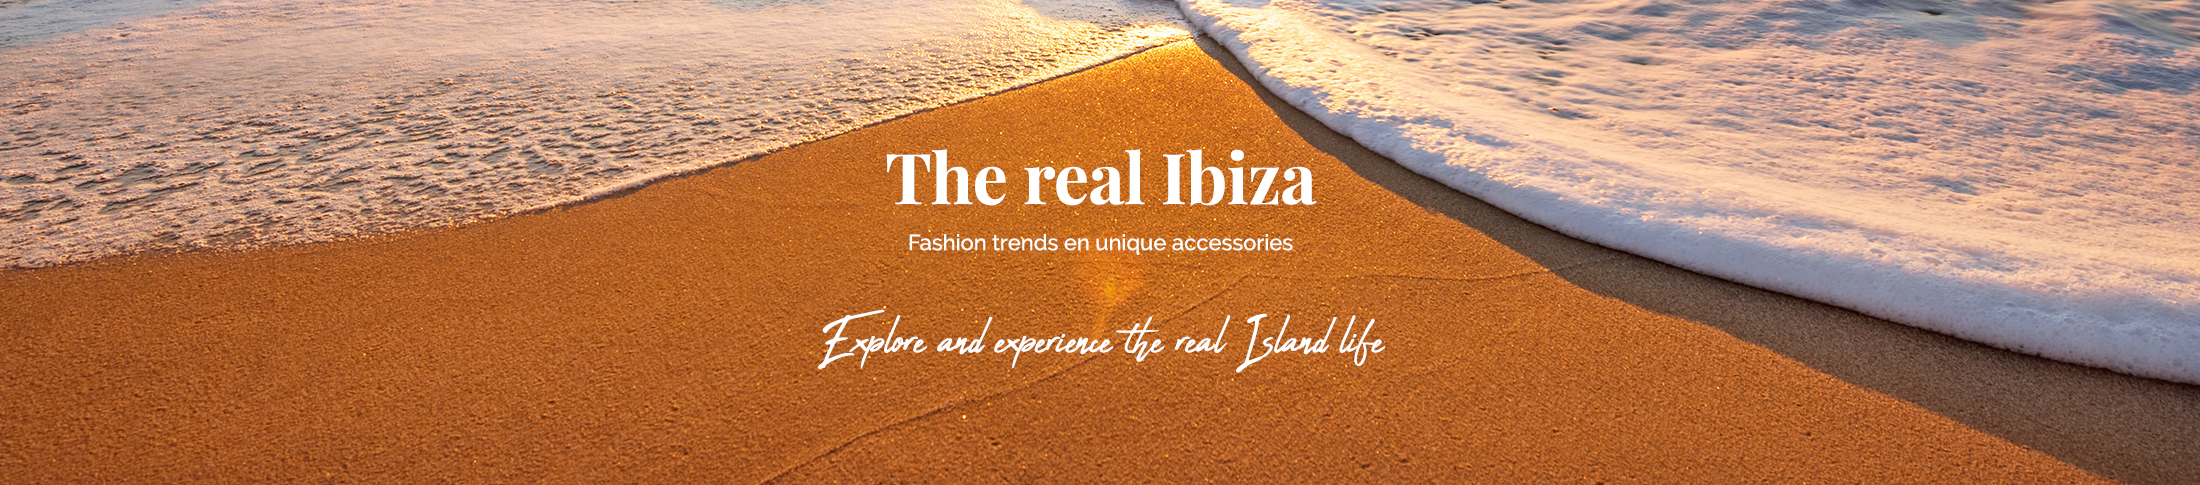 Gipsy Ibiza webwinkel